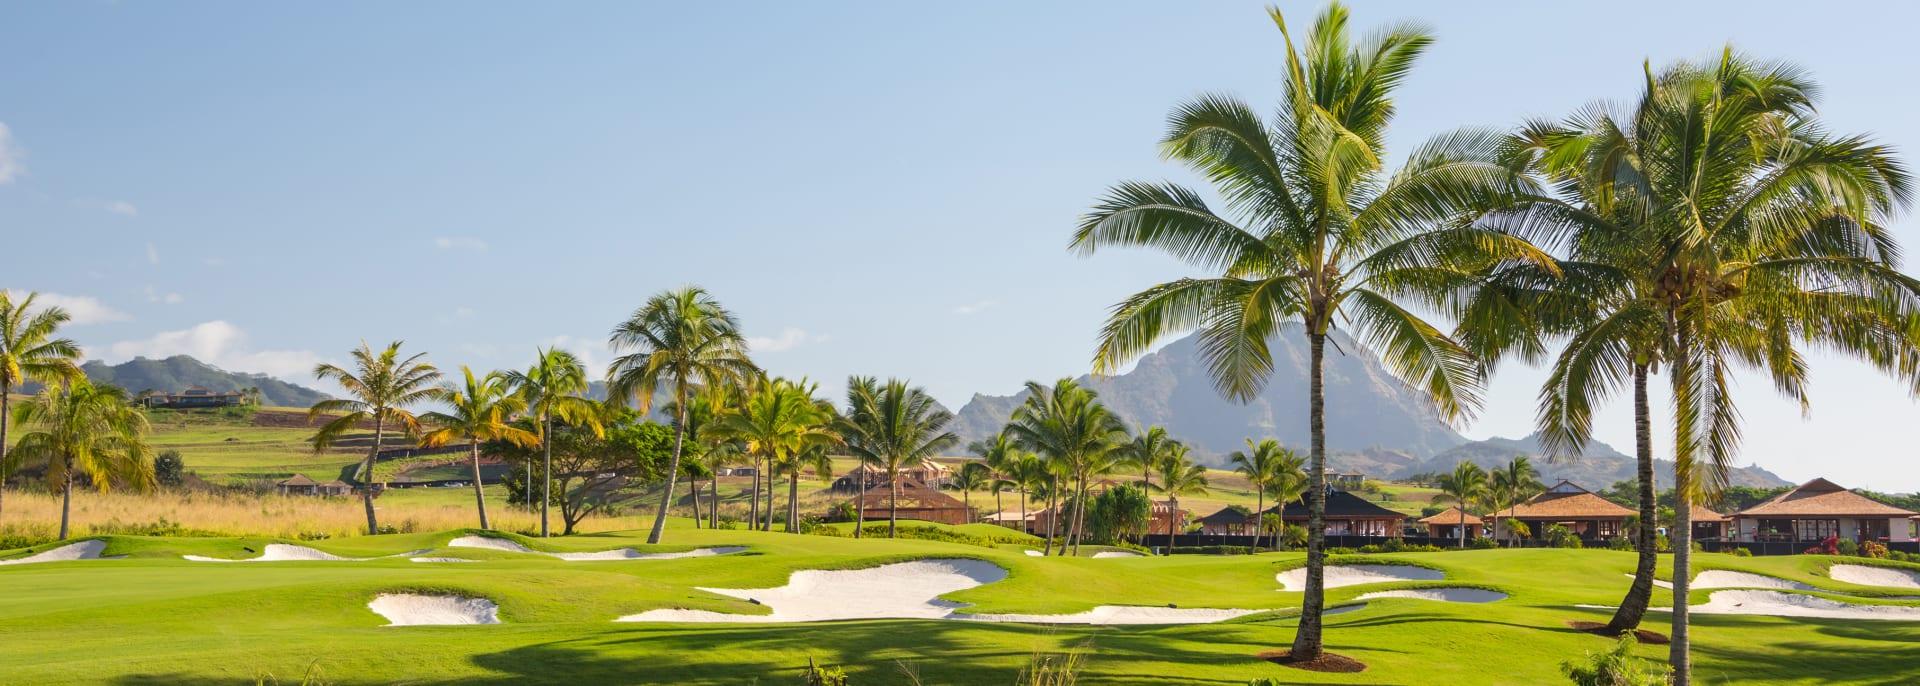 Golfreisen, Mauritius